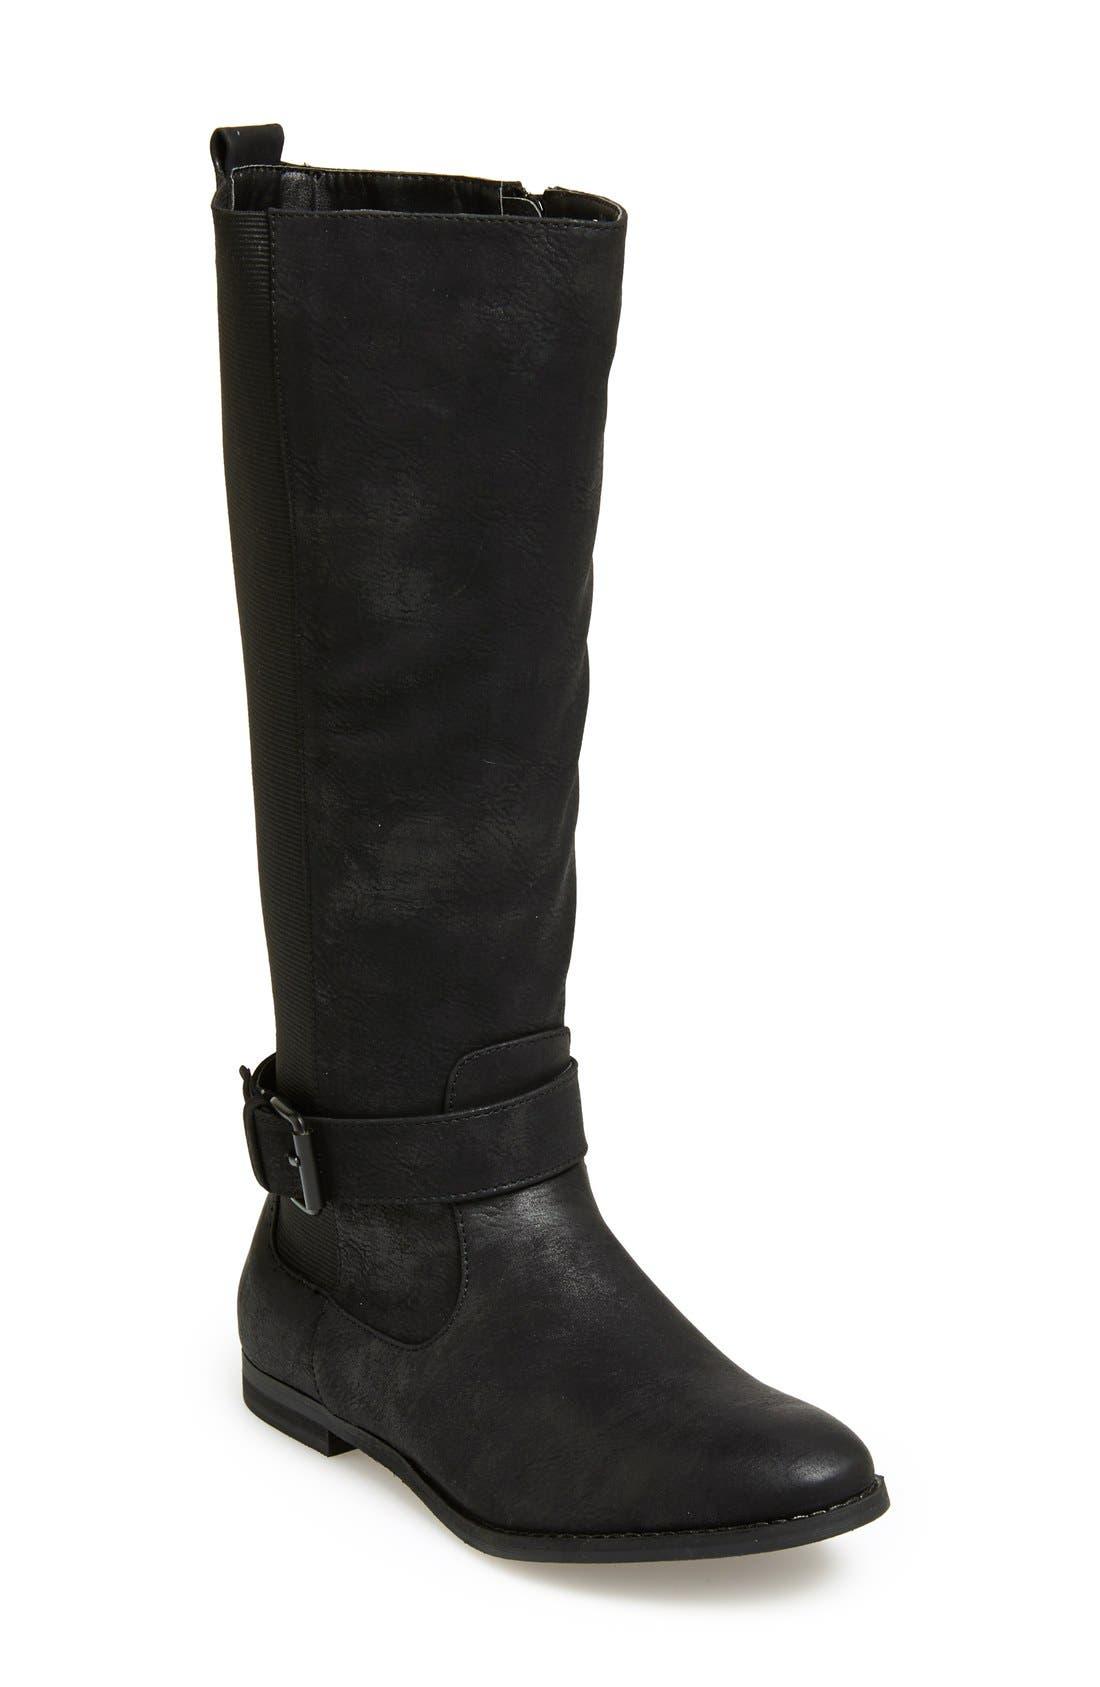 Alternate Image 1 Selected - Very Volatile 'Griggs' Boot (Women)